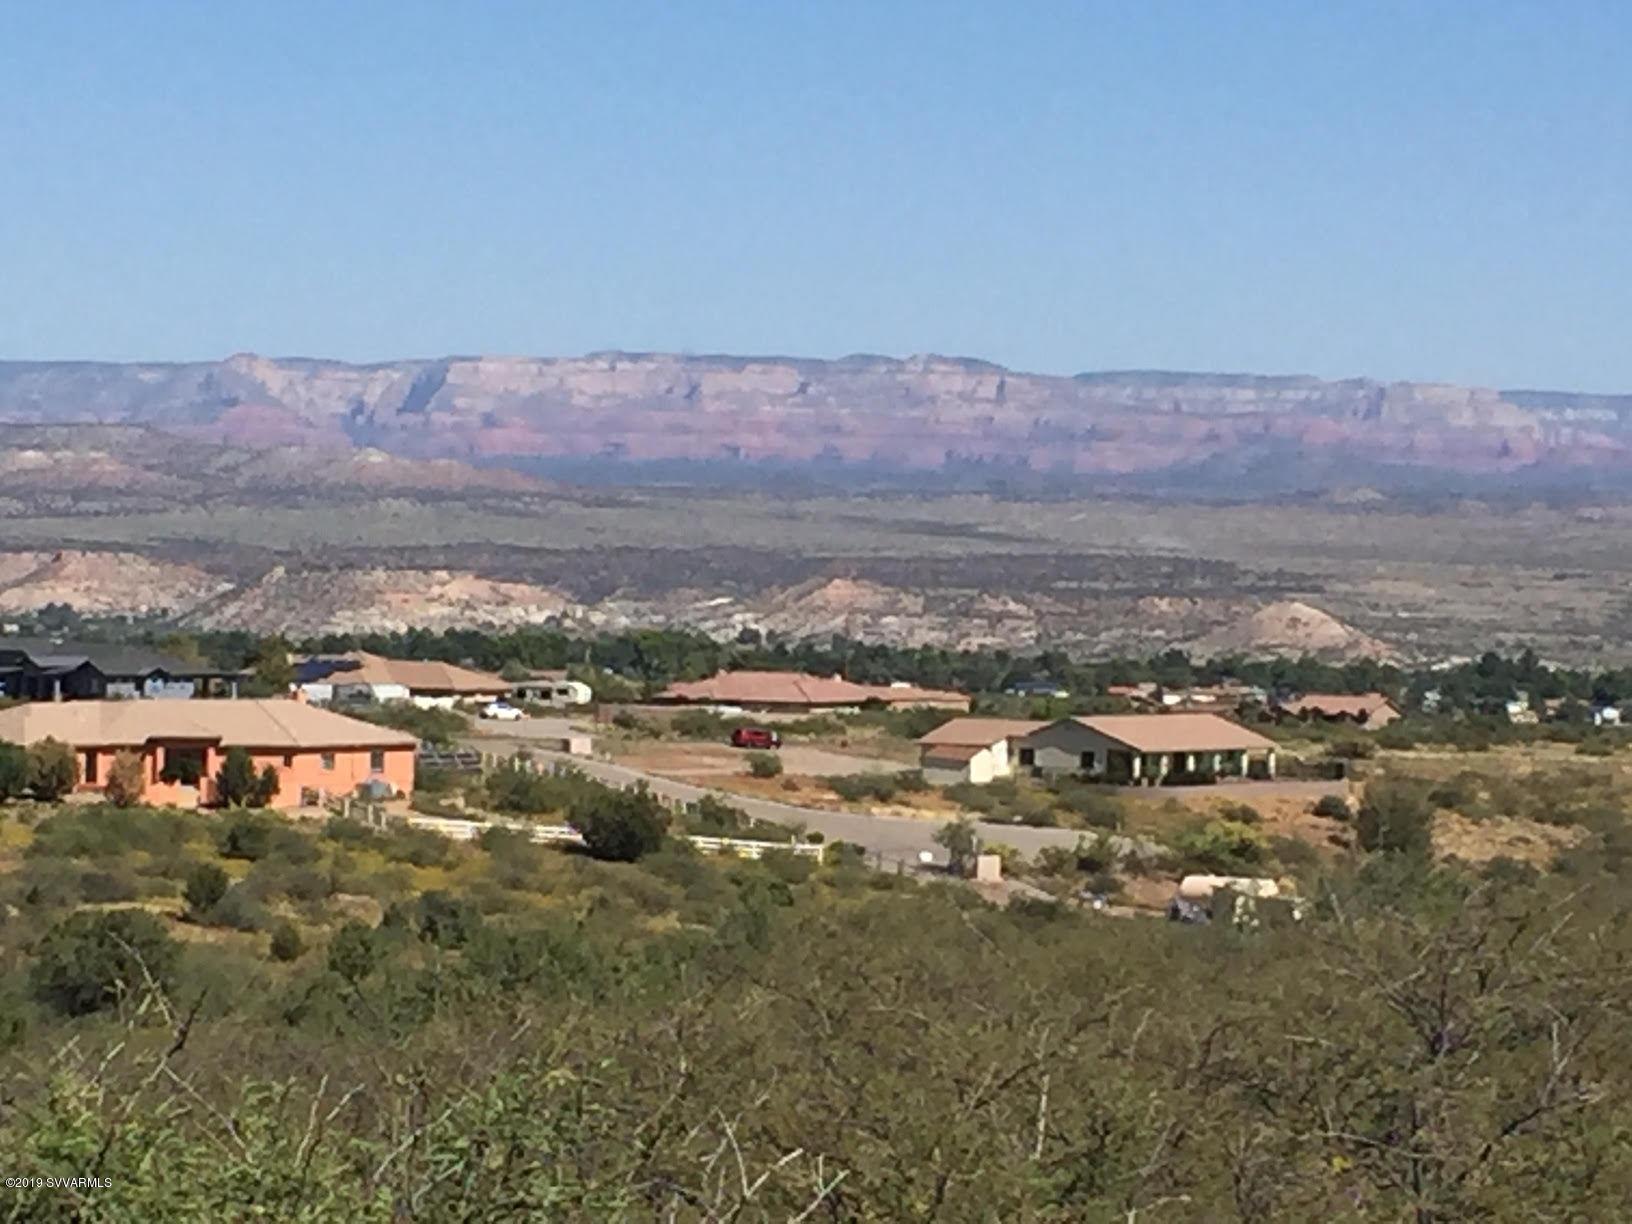 Tbd-2 S Loreto Trail Cottonwood, AZ 86326